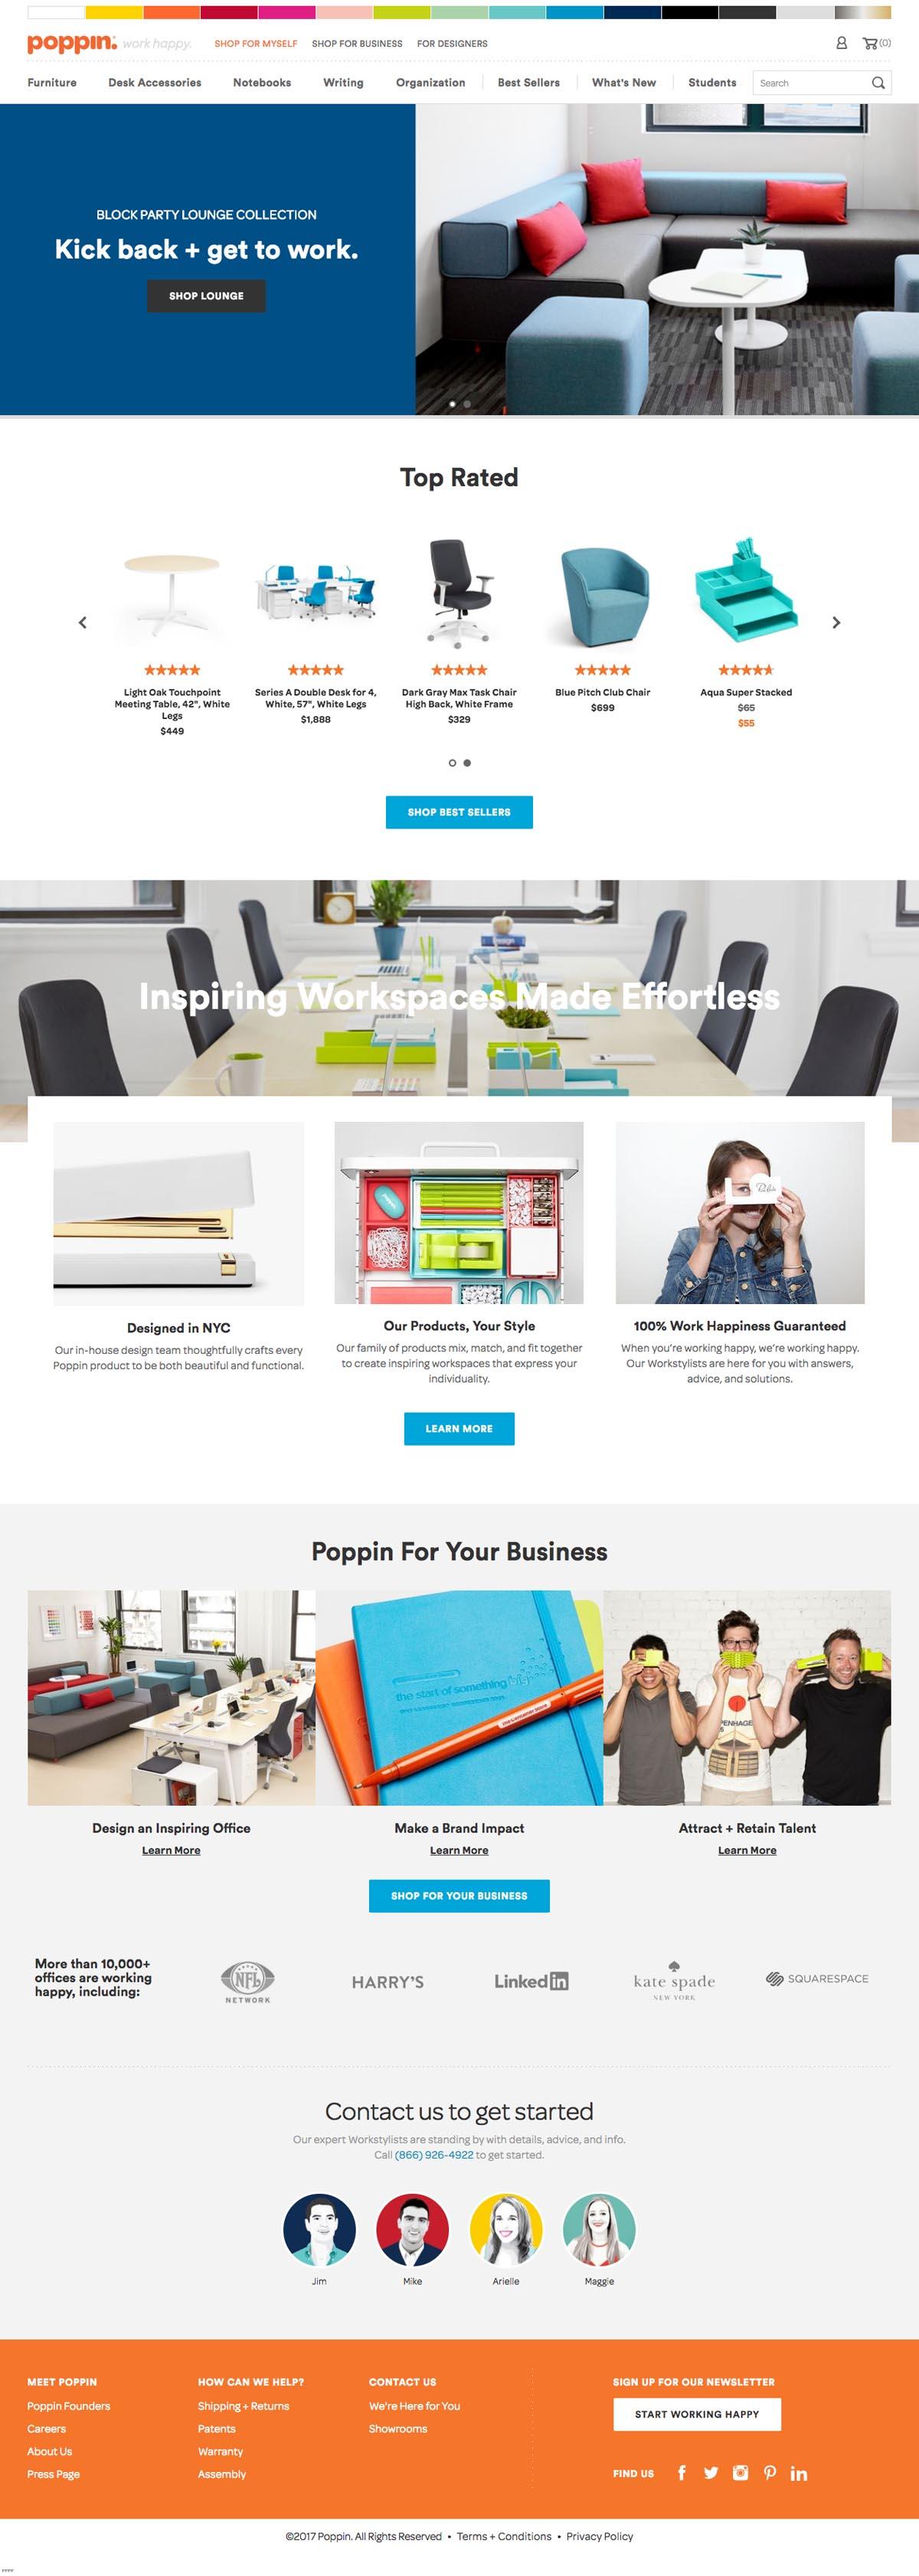 eCommerce website: Poppin